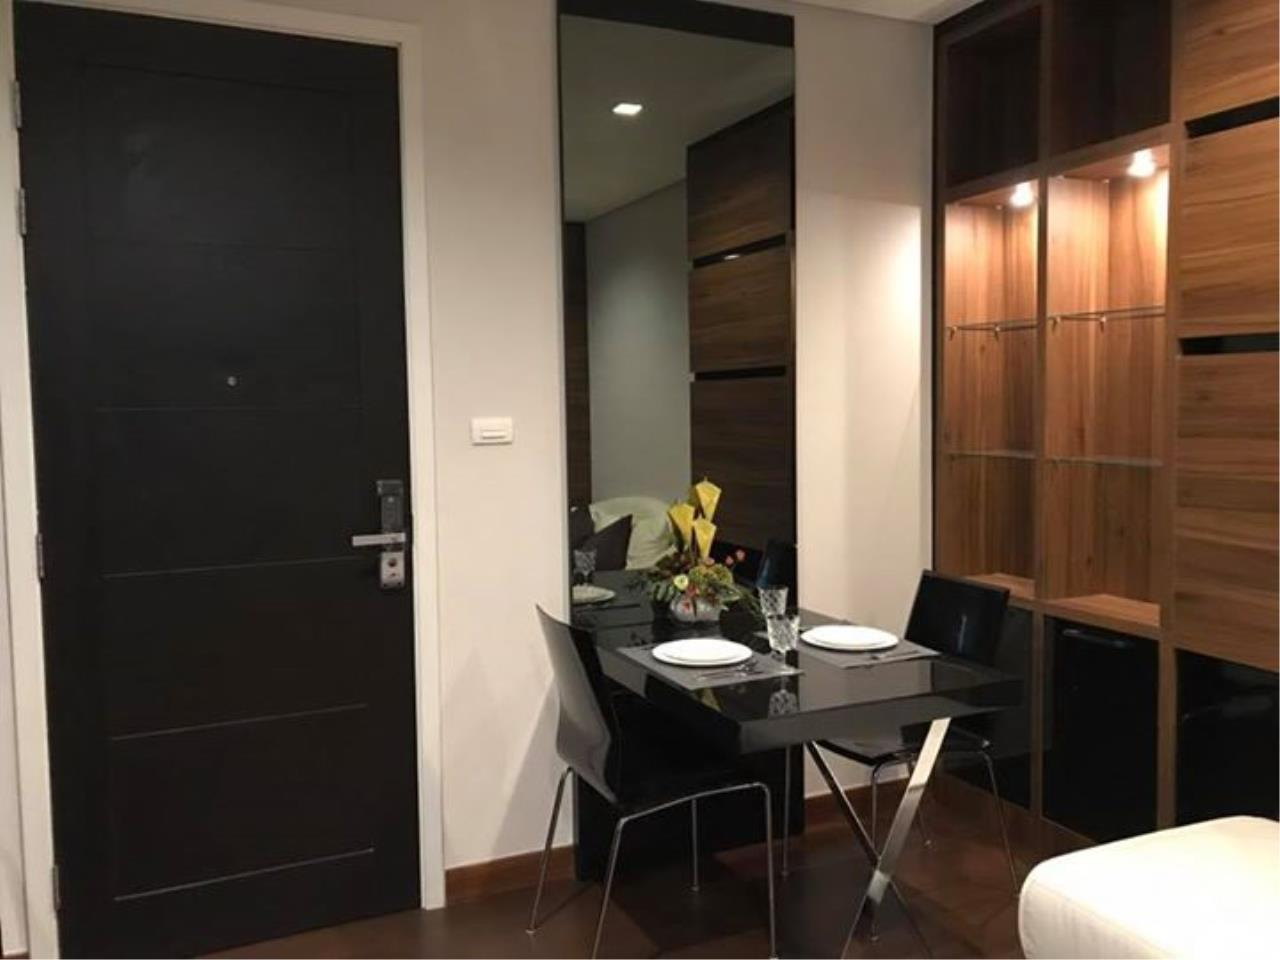 Quality Life Property Agency's S A L E & R E N T !! [ IVY THONGLOR ] Studio 35.63 Sq.m. New Decoration !! 4